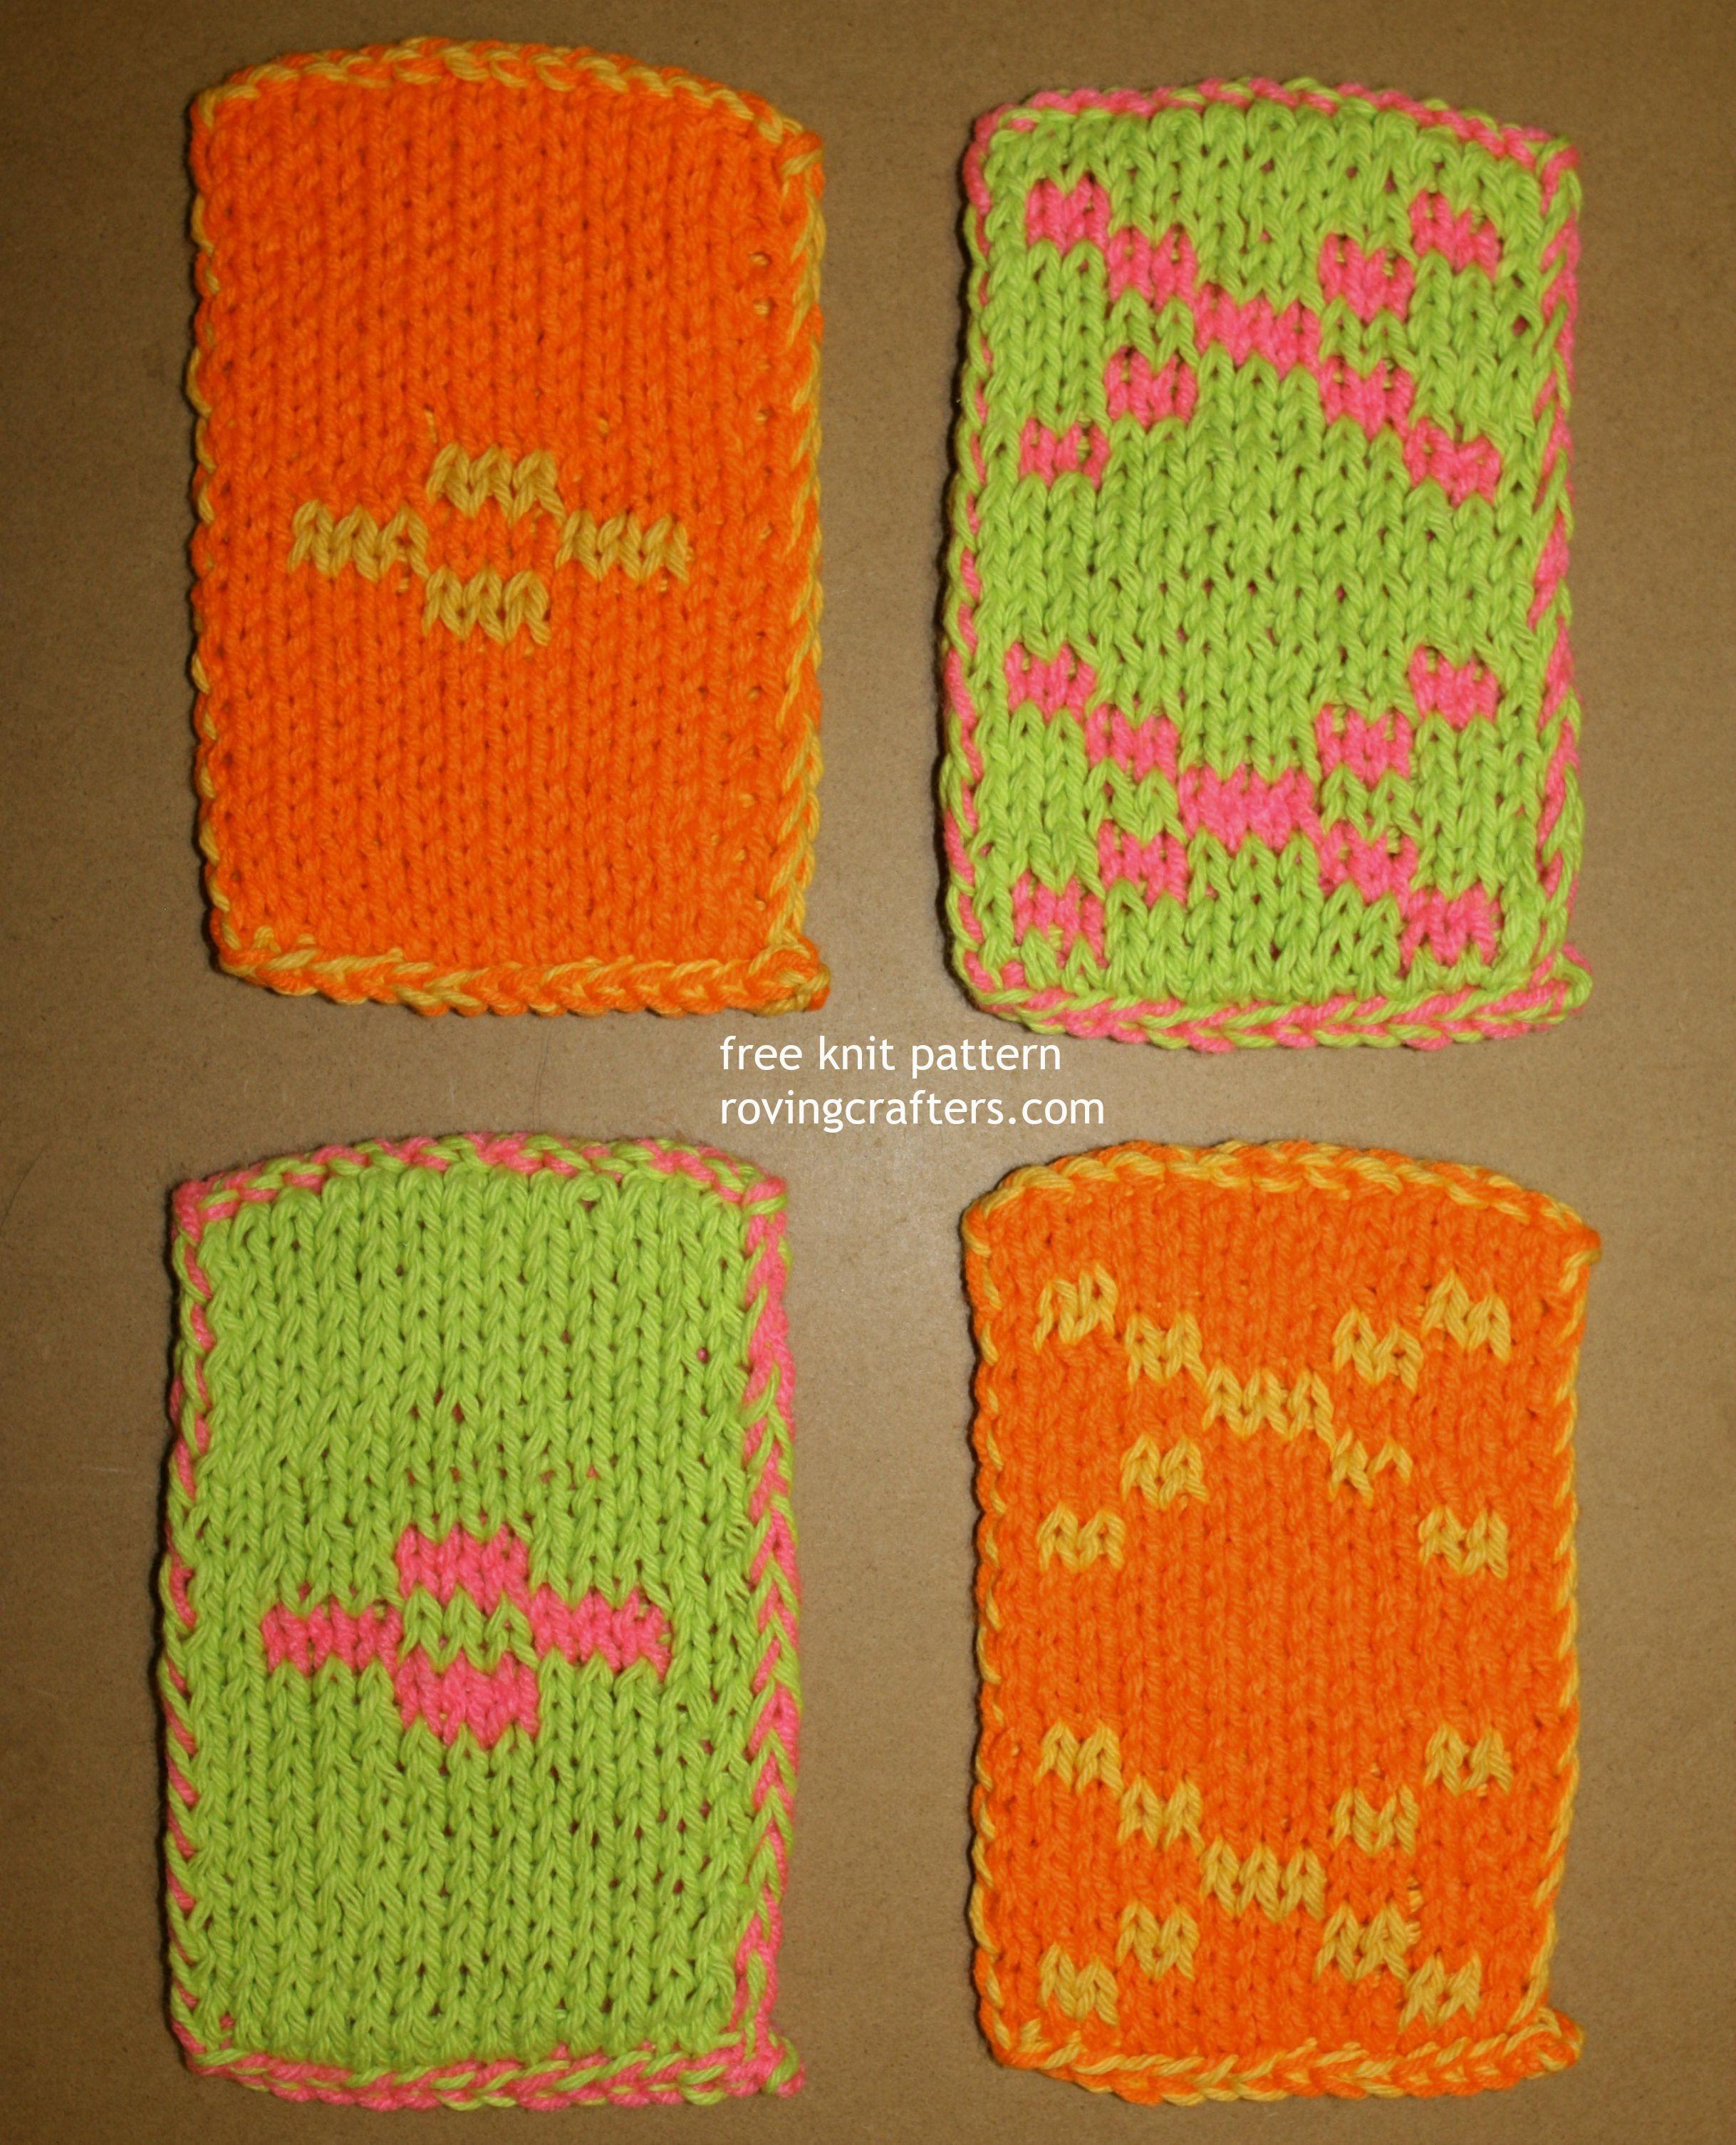 free knit pattern - double sided pot scrubbers   Knitting Patterns ...